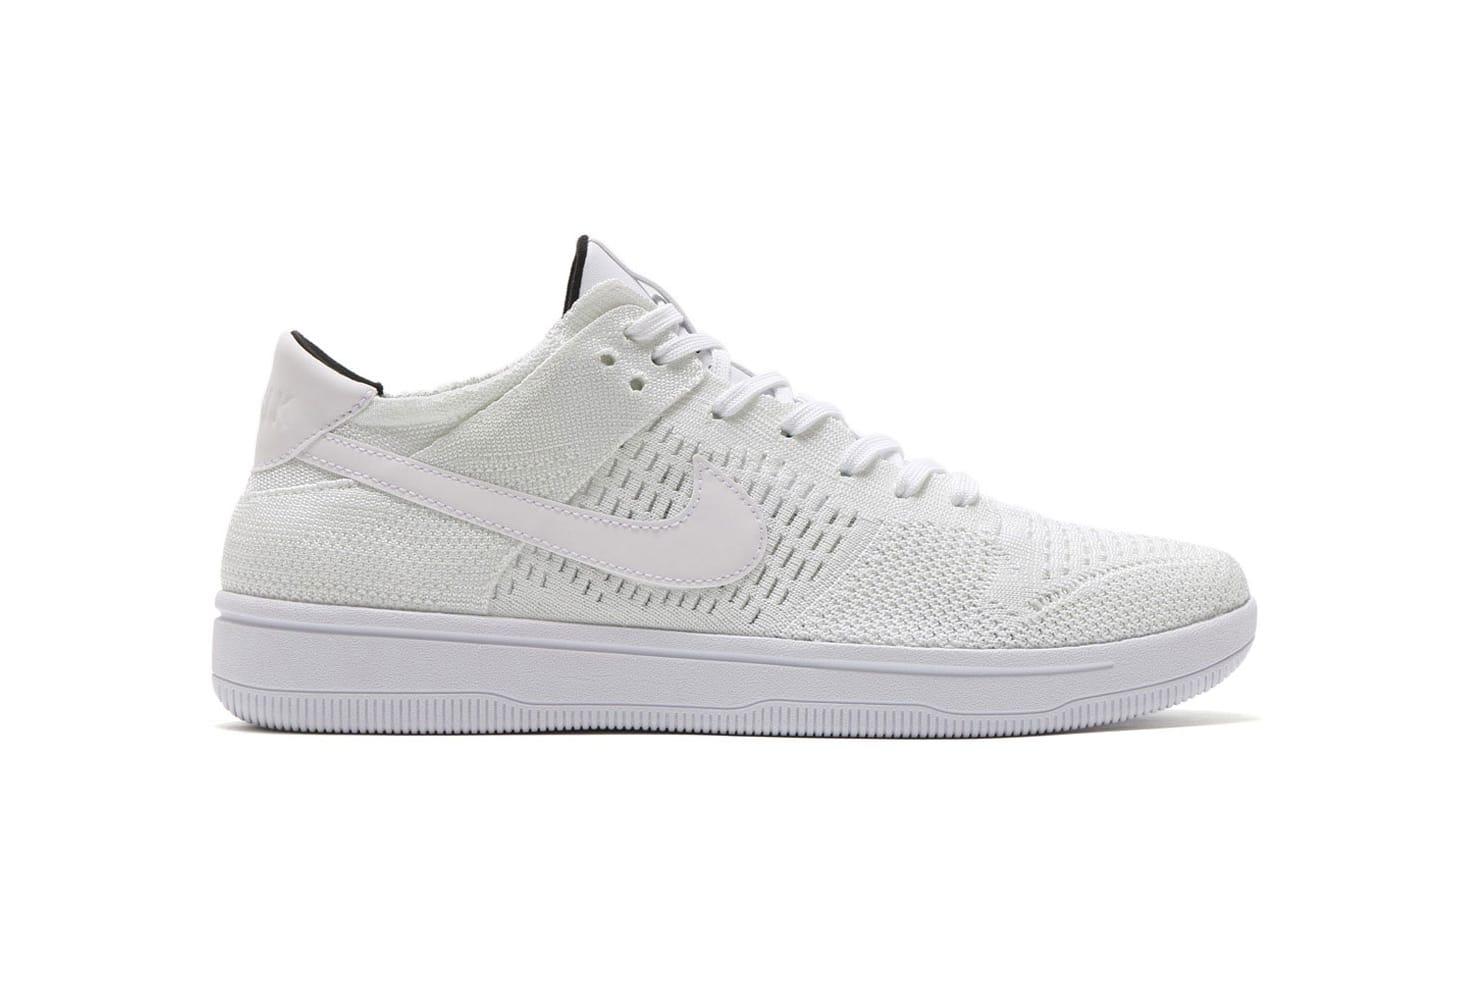 Nike Dunk Low Flyknit White/Black